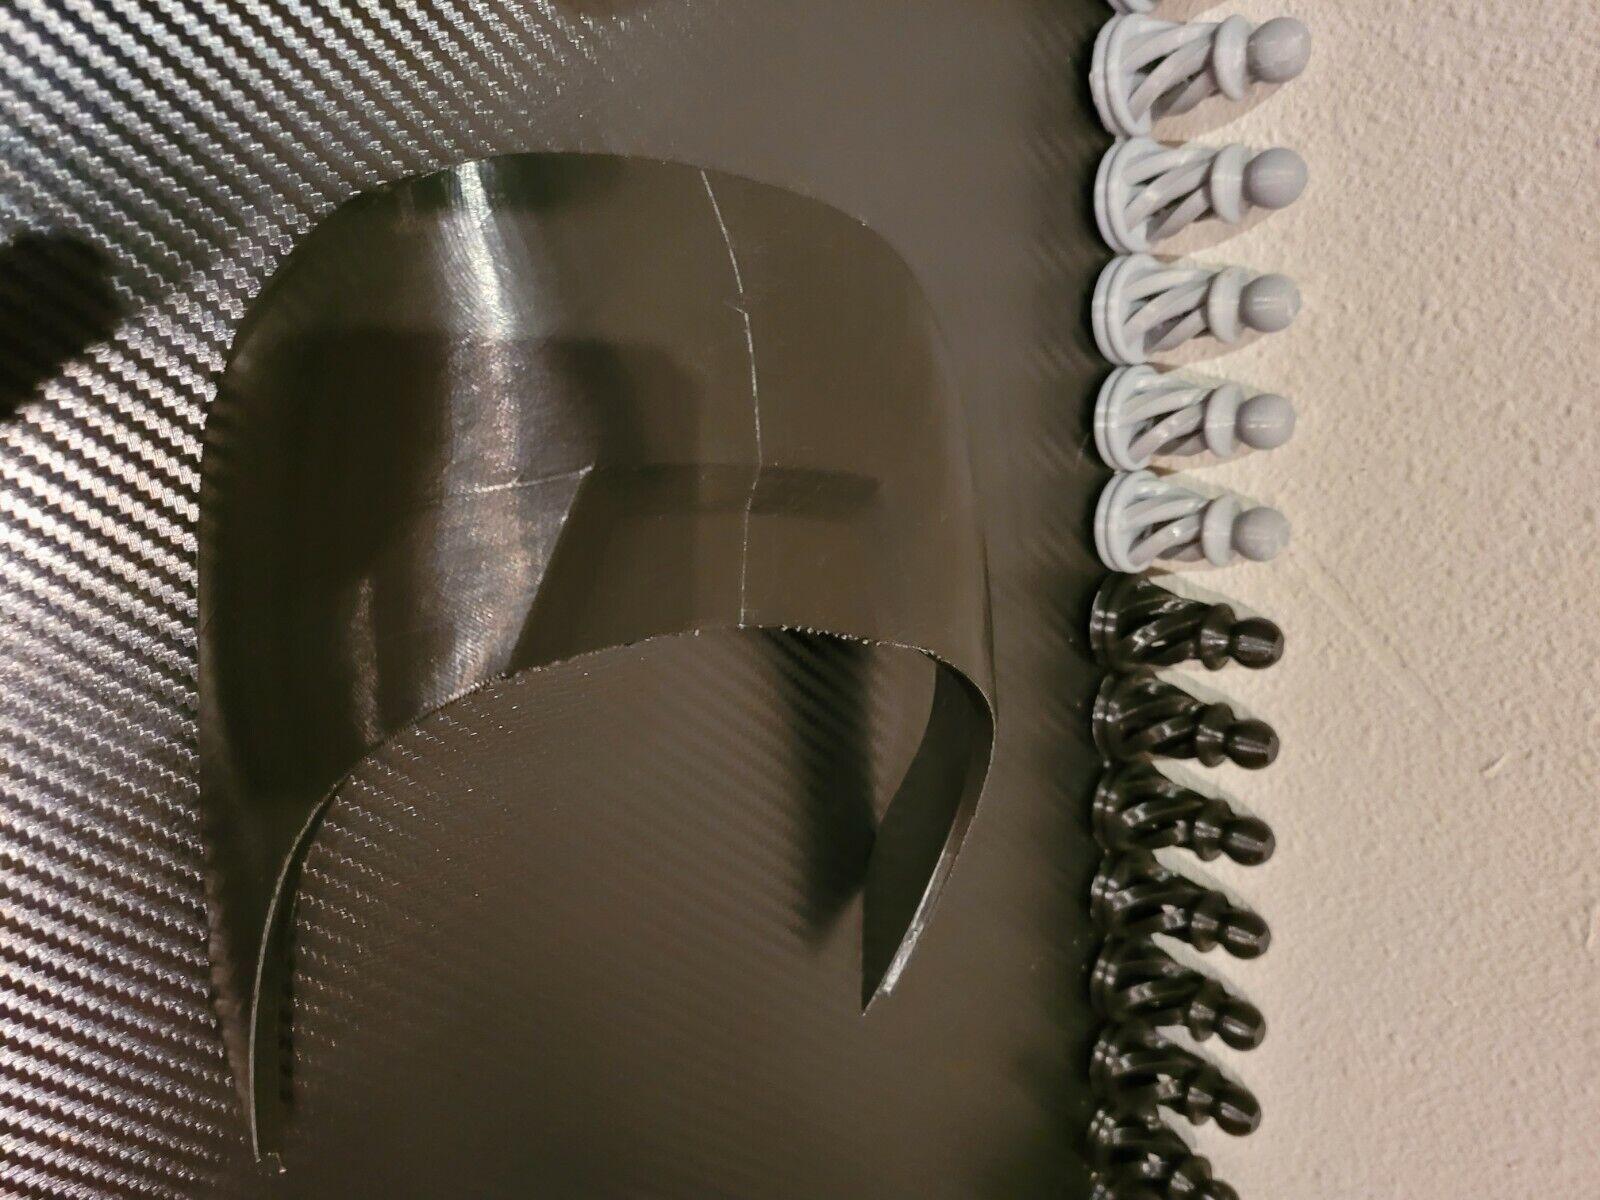 3 d print iron man helmet do it yourself DIY kit you can wear